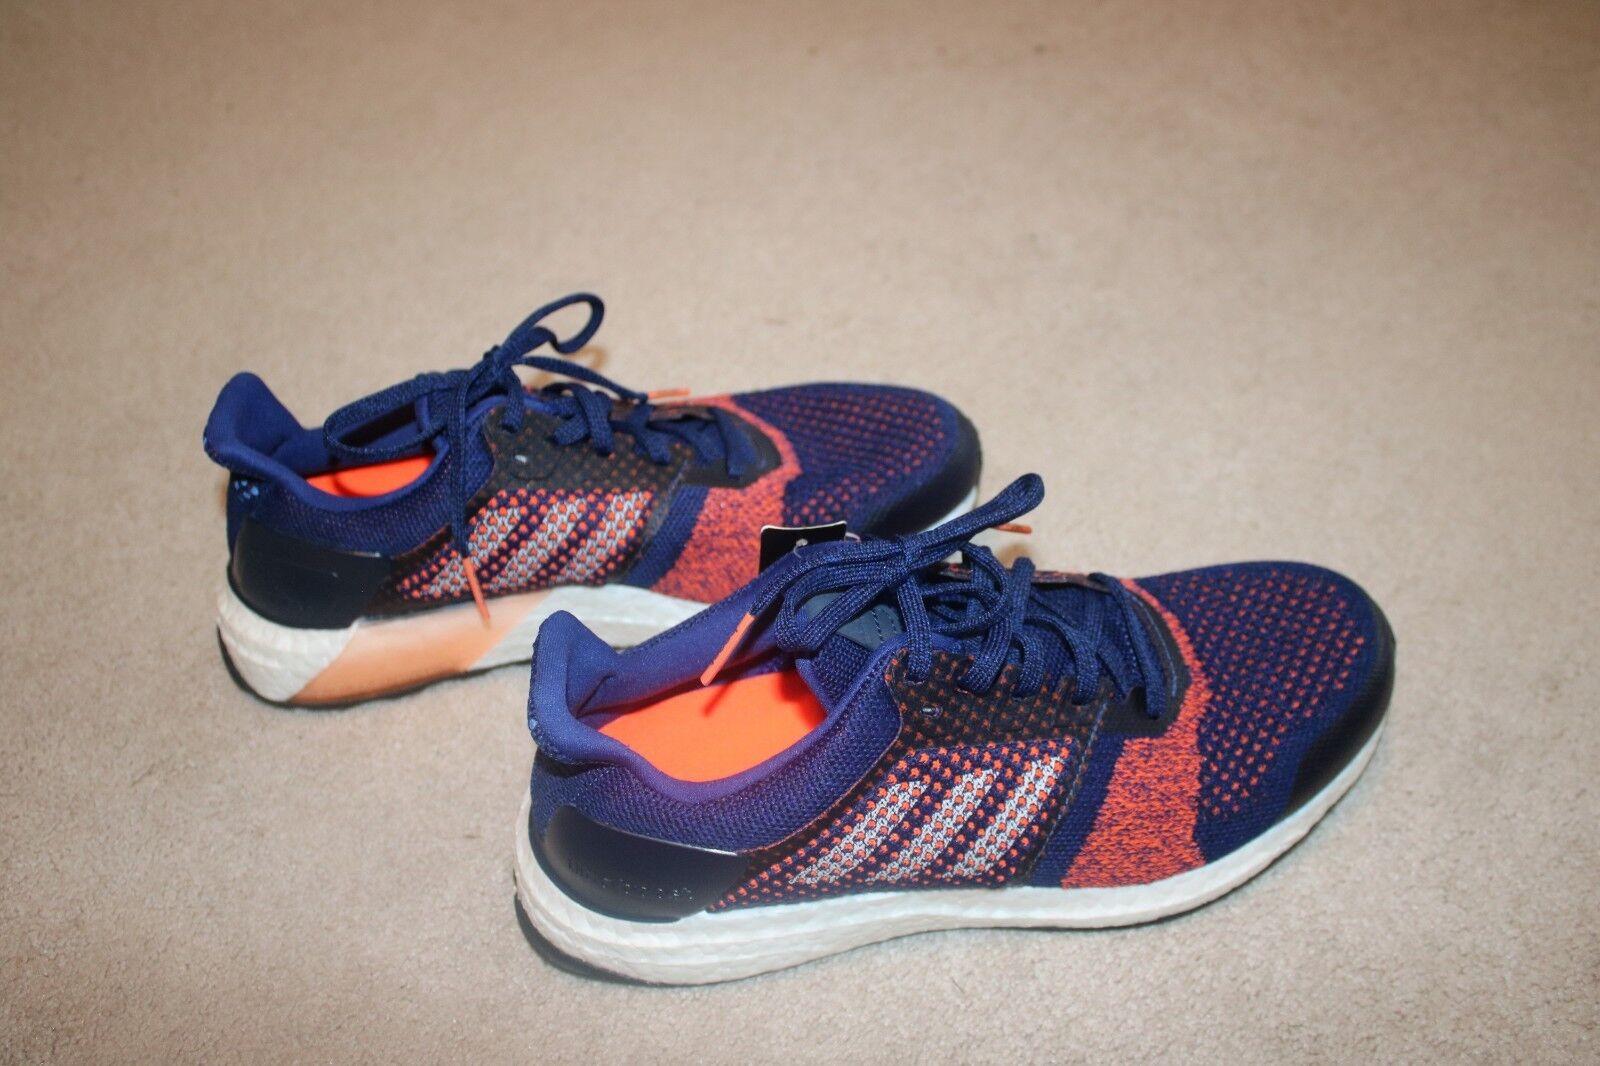 Adidas ultra 8 Boost St zapatos primeknit Upper Upper primeknit hombre 8 ultra mujer db6e9f